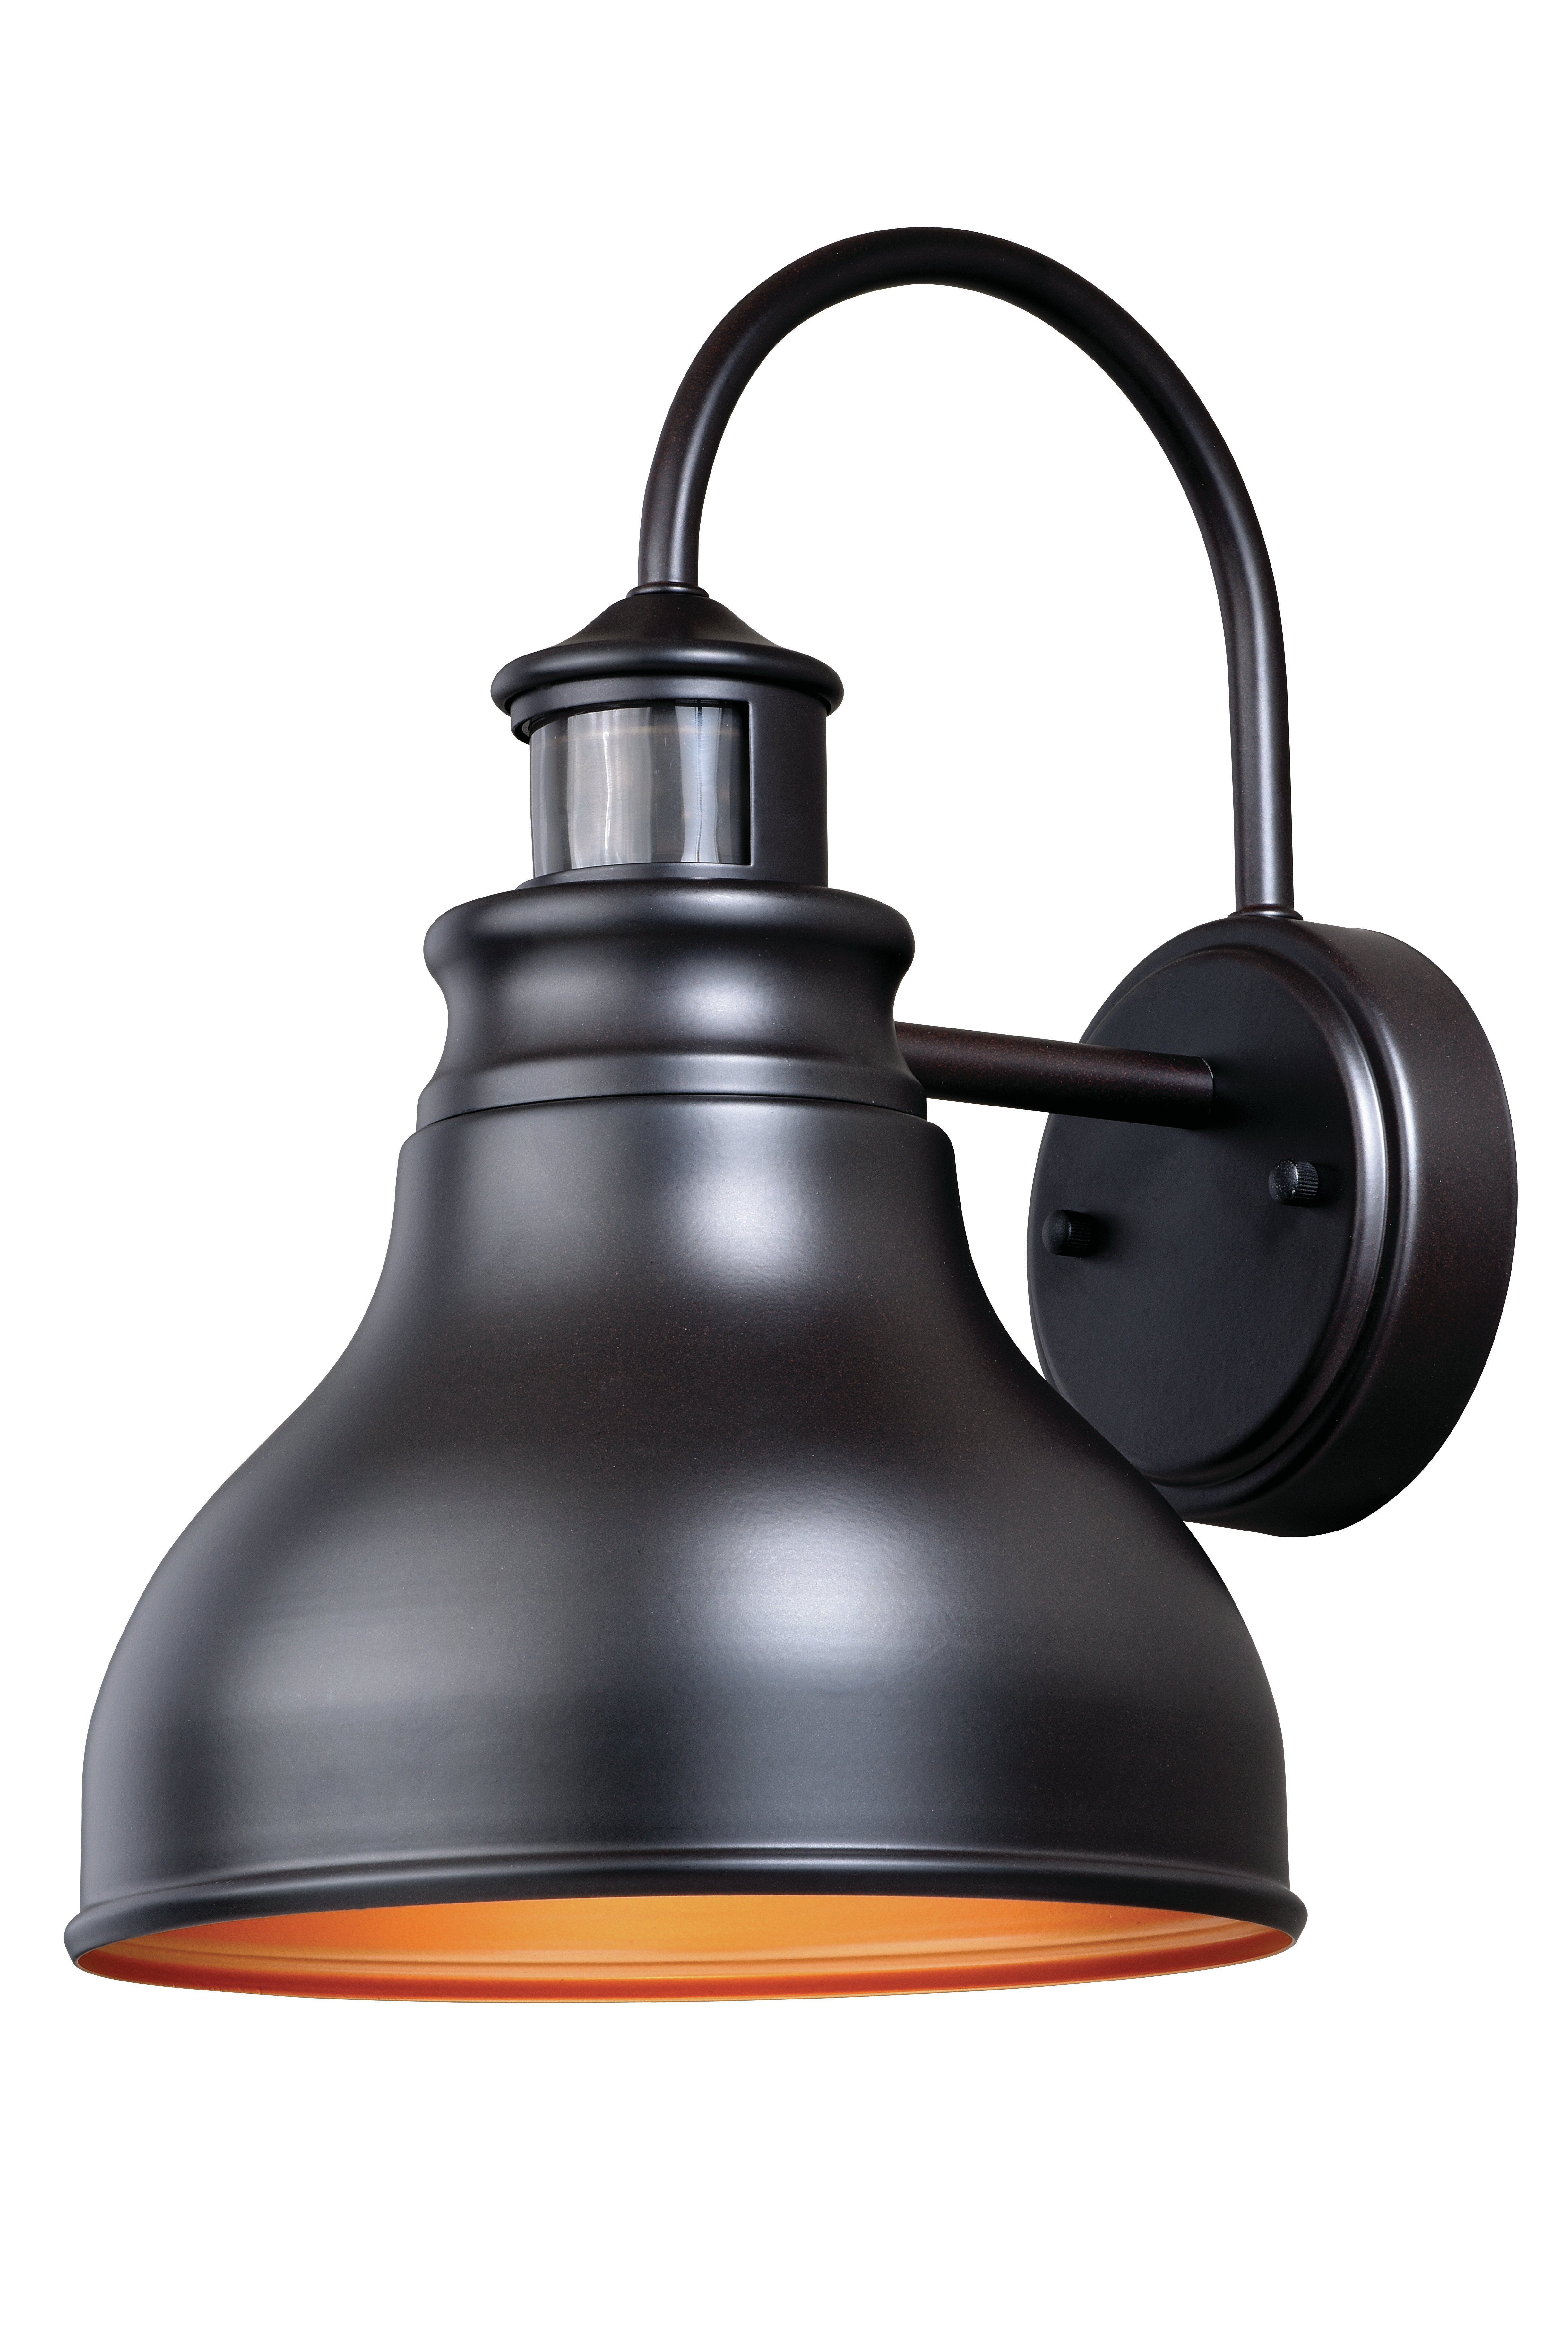 Premium Mordern Wall Lanterns For Dusk-To-Dawn Illumination Pack Of  9